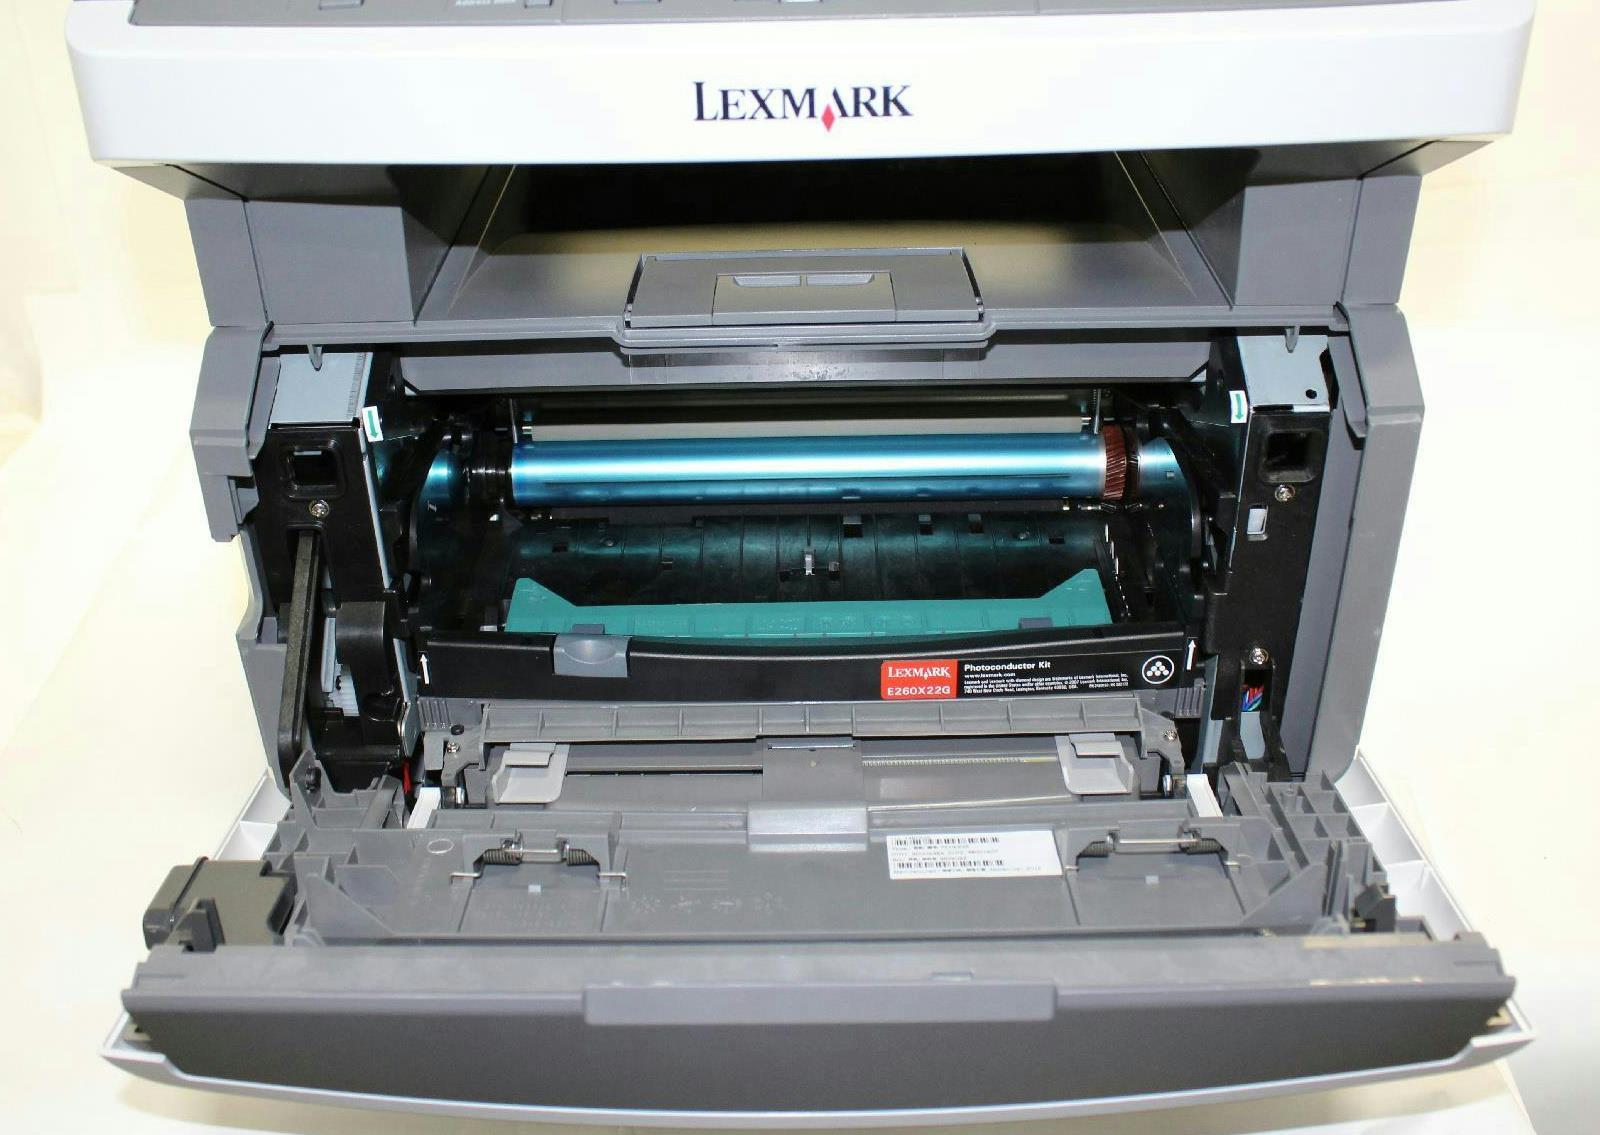 Lexmark X264 Printer Universal PCL5e Driver for Windows